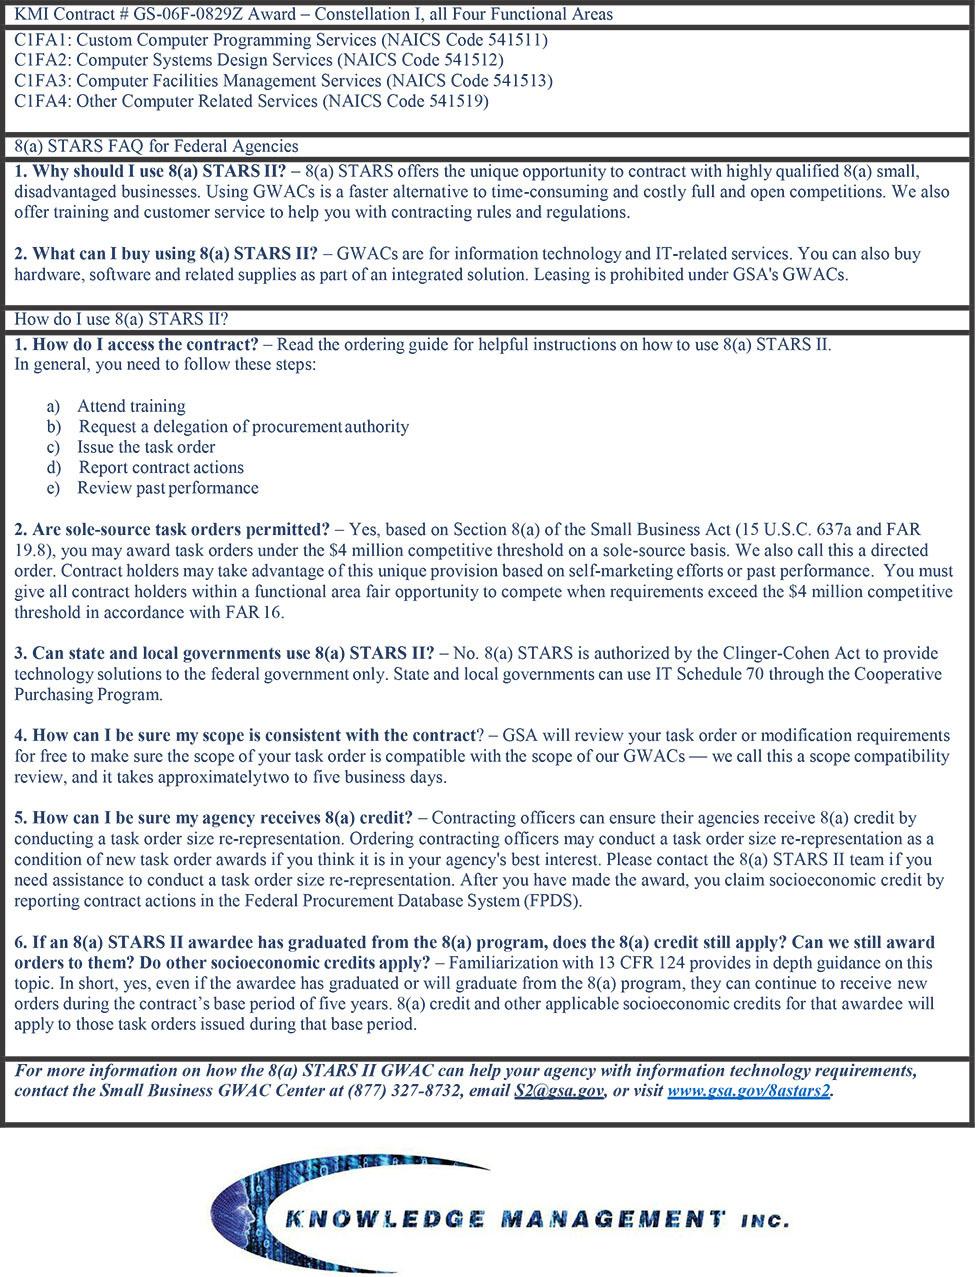 KMI-8(a)-STARS-II-Datasheet-22-March-2019-2a